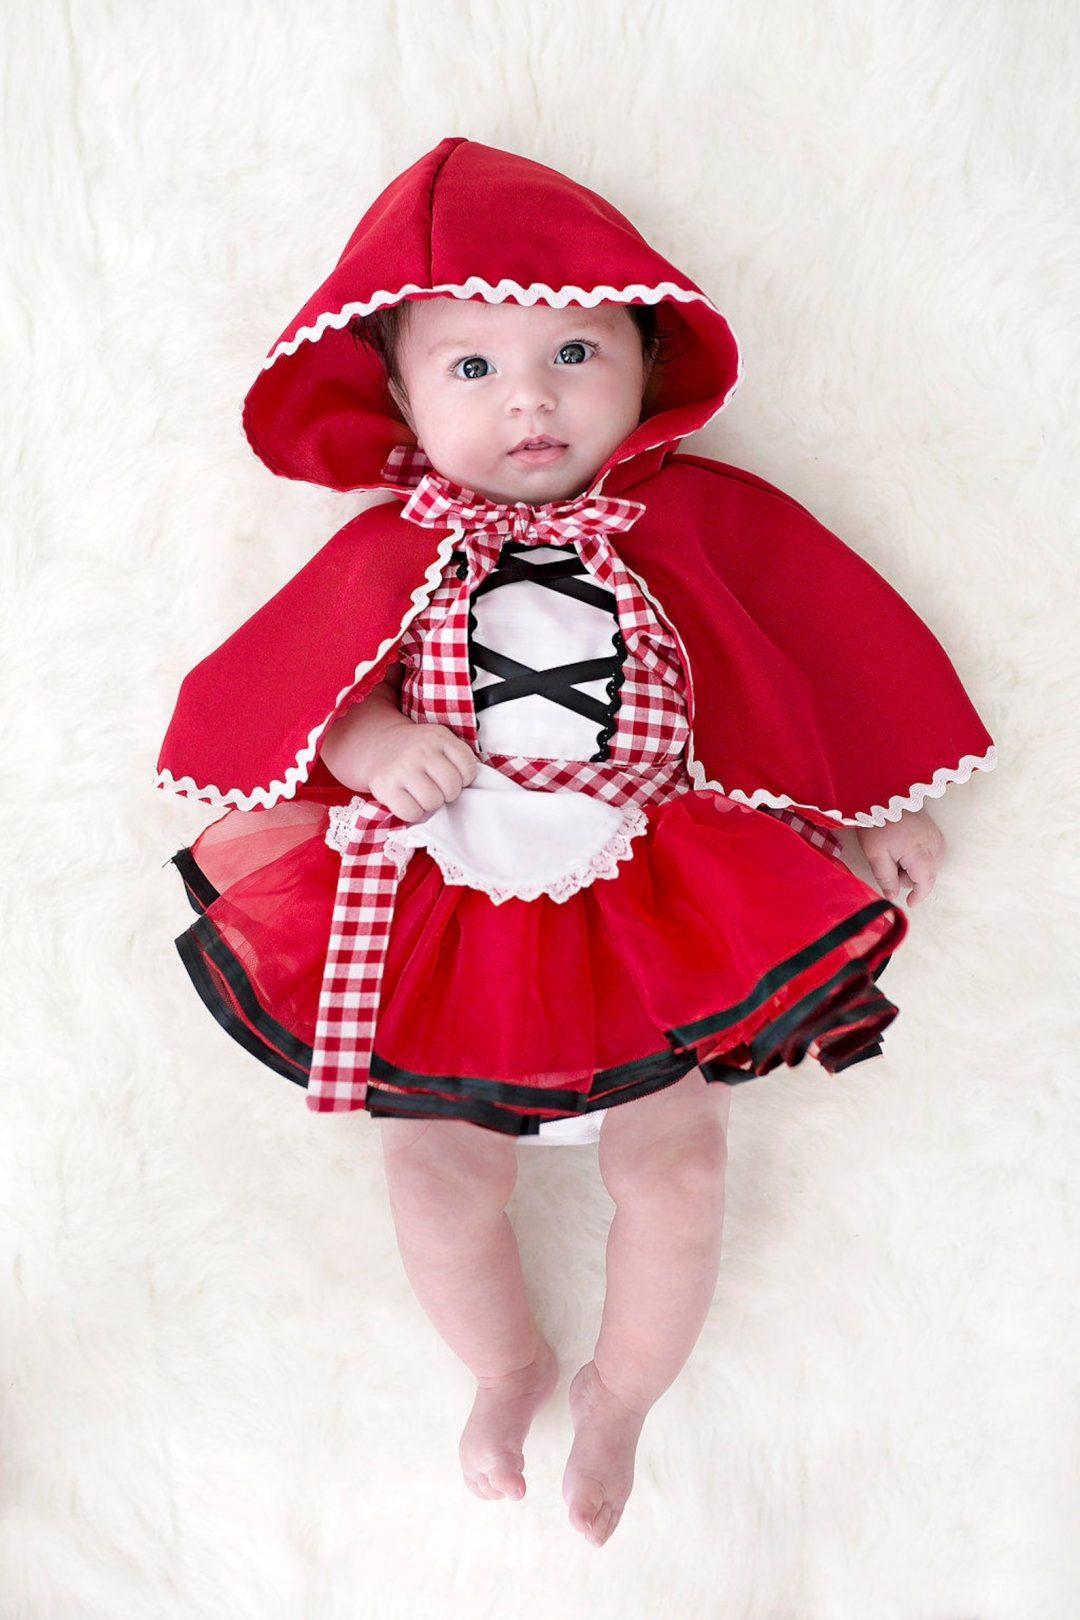 Best Newborn Halloween Costumes: Little red riding hood costume